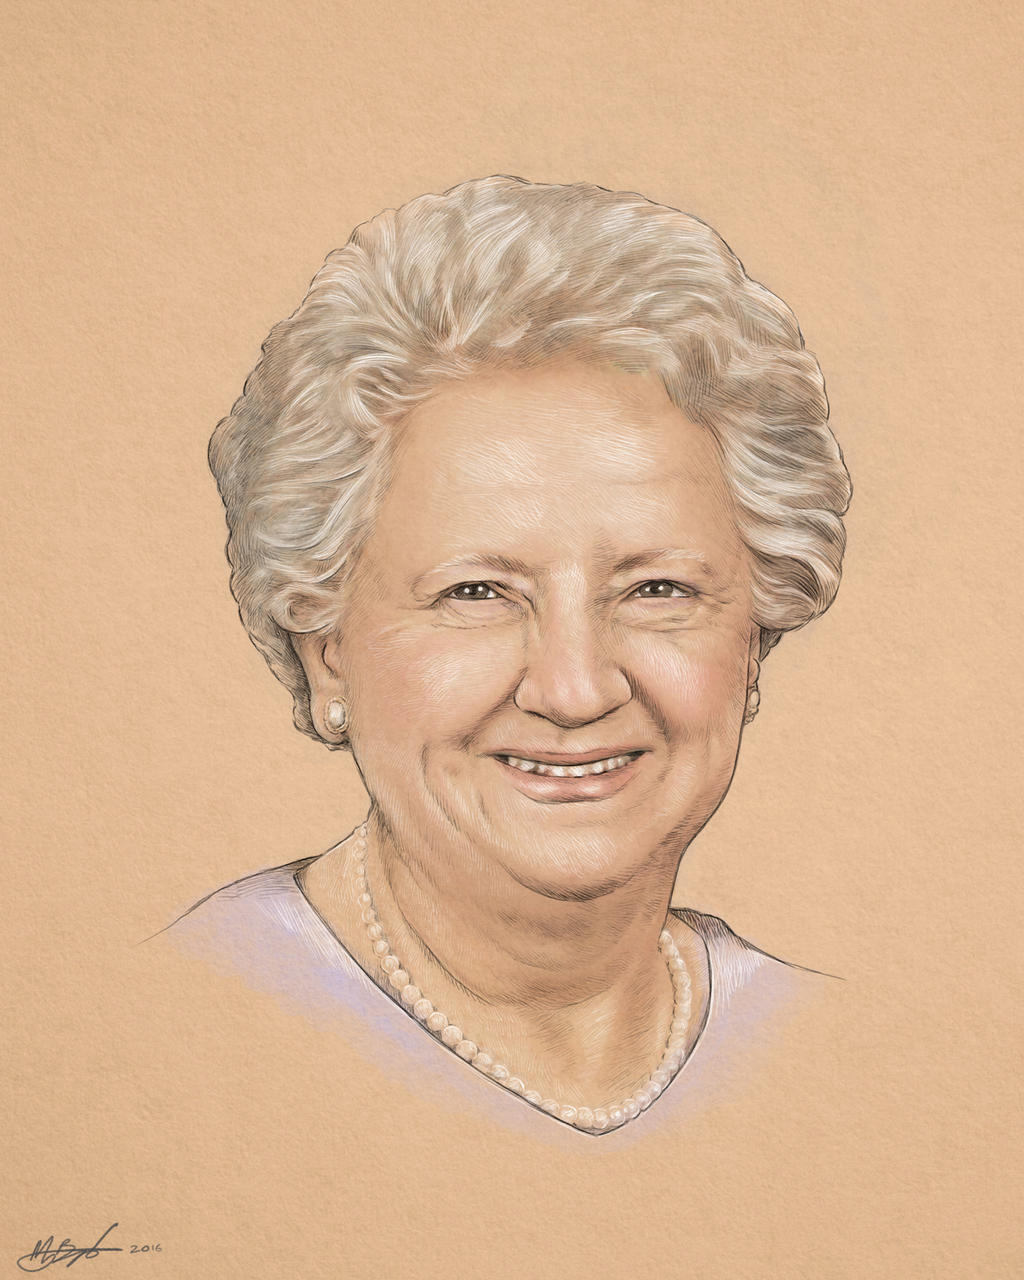 Grandma portrait by scumbugg